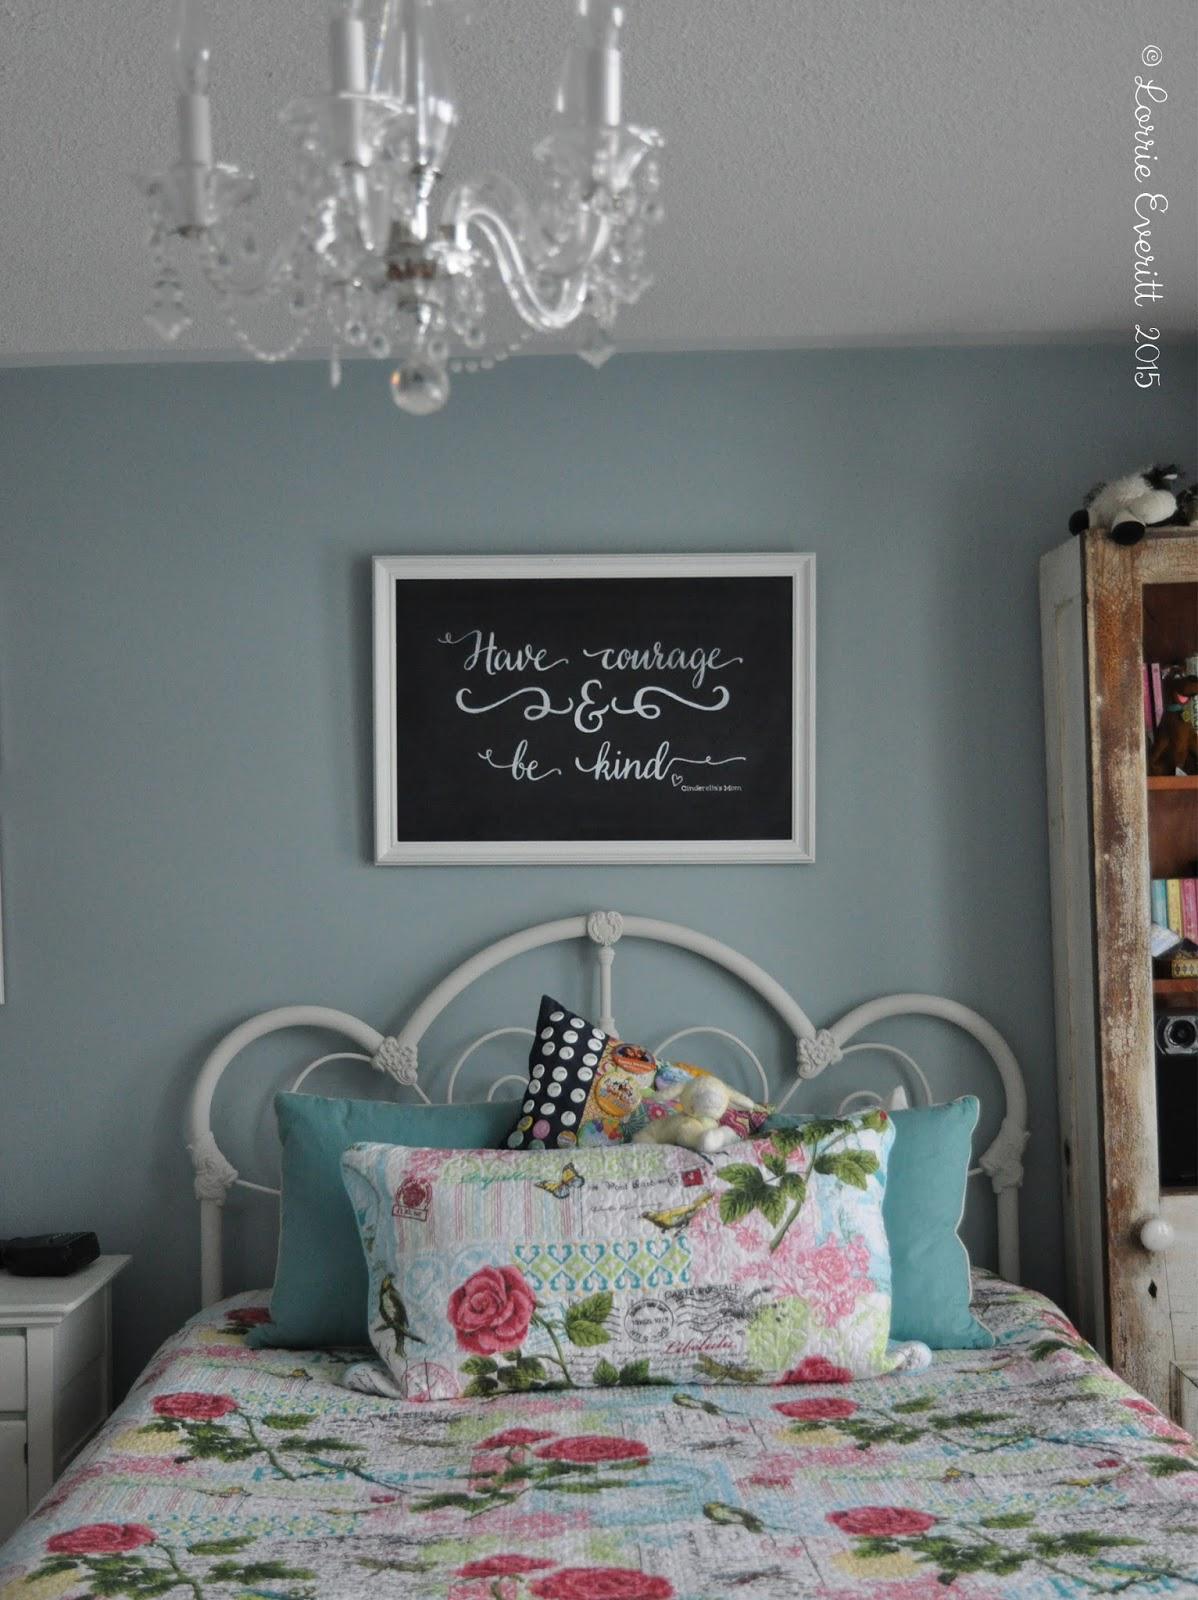 chalkboard art with quote from Disney Cinderella movie | Lorrie Everitt Studio